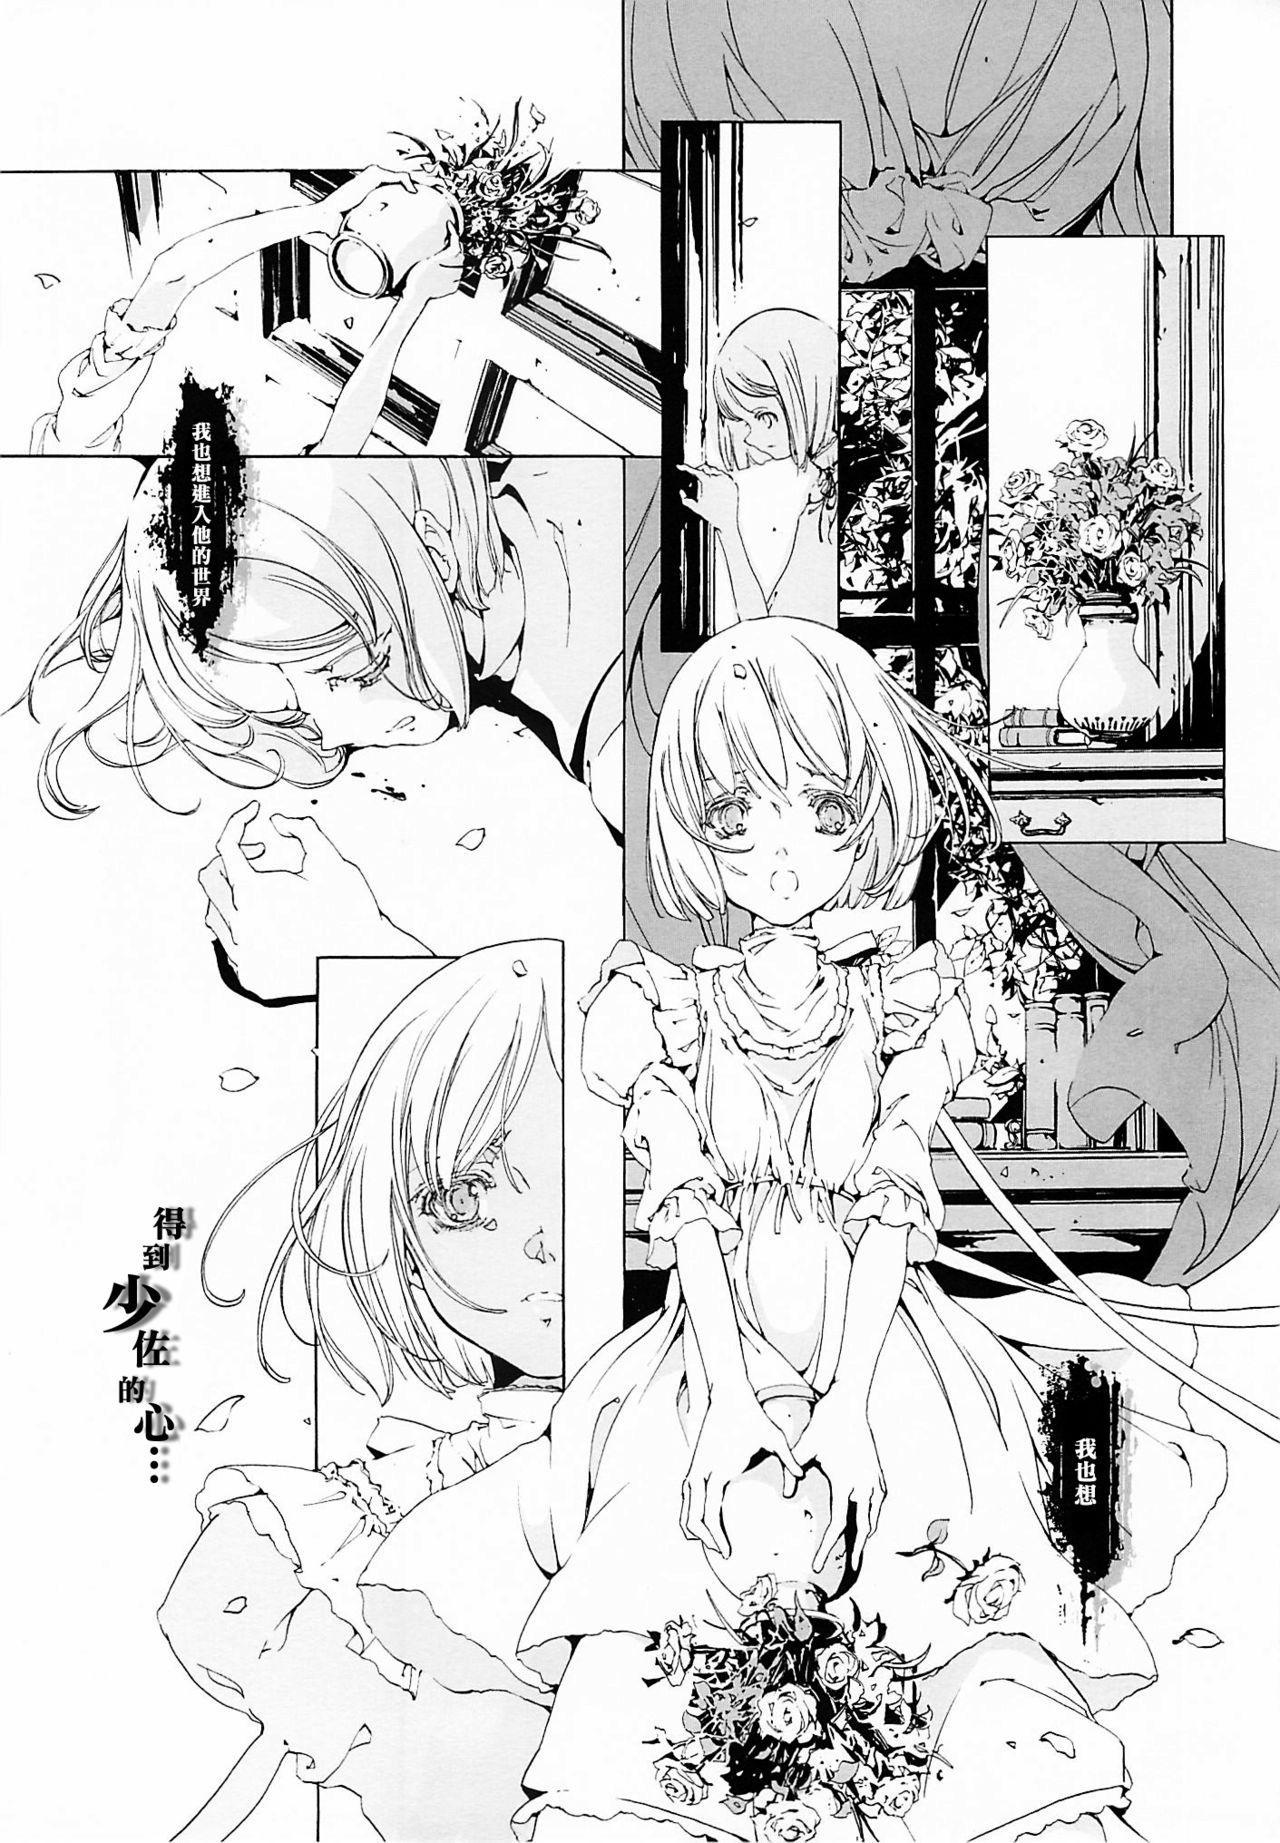 (CR37) [70 Nenshiki Yuukyuu Kikan (Endou Okito)] ORGAN-Tino  01-02[Chinese] [拾荒者汉化组] [Incomplete] 90